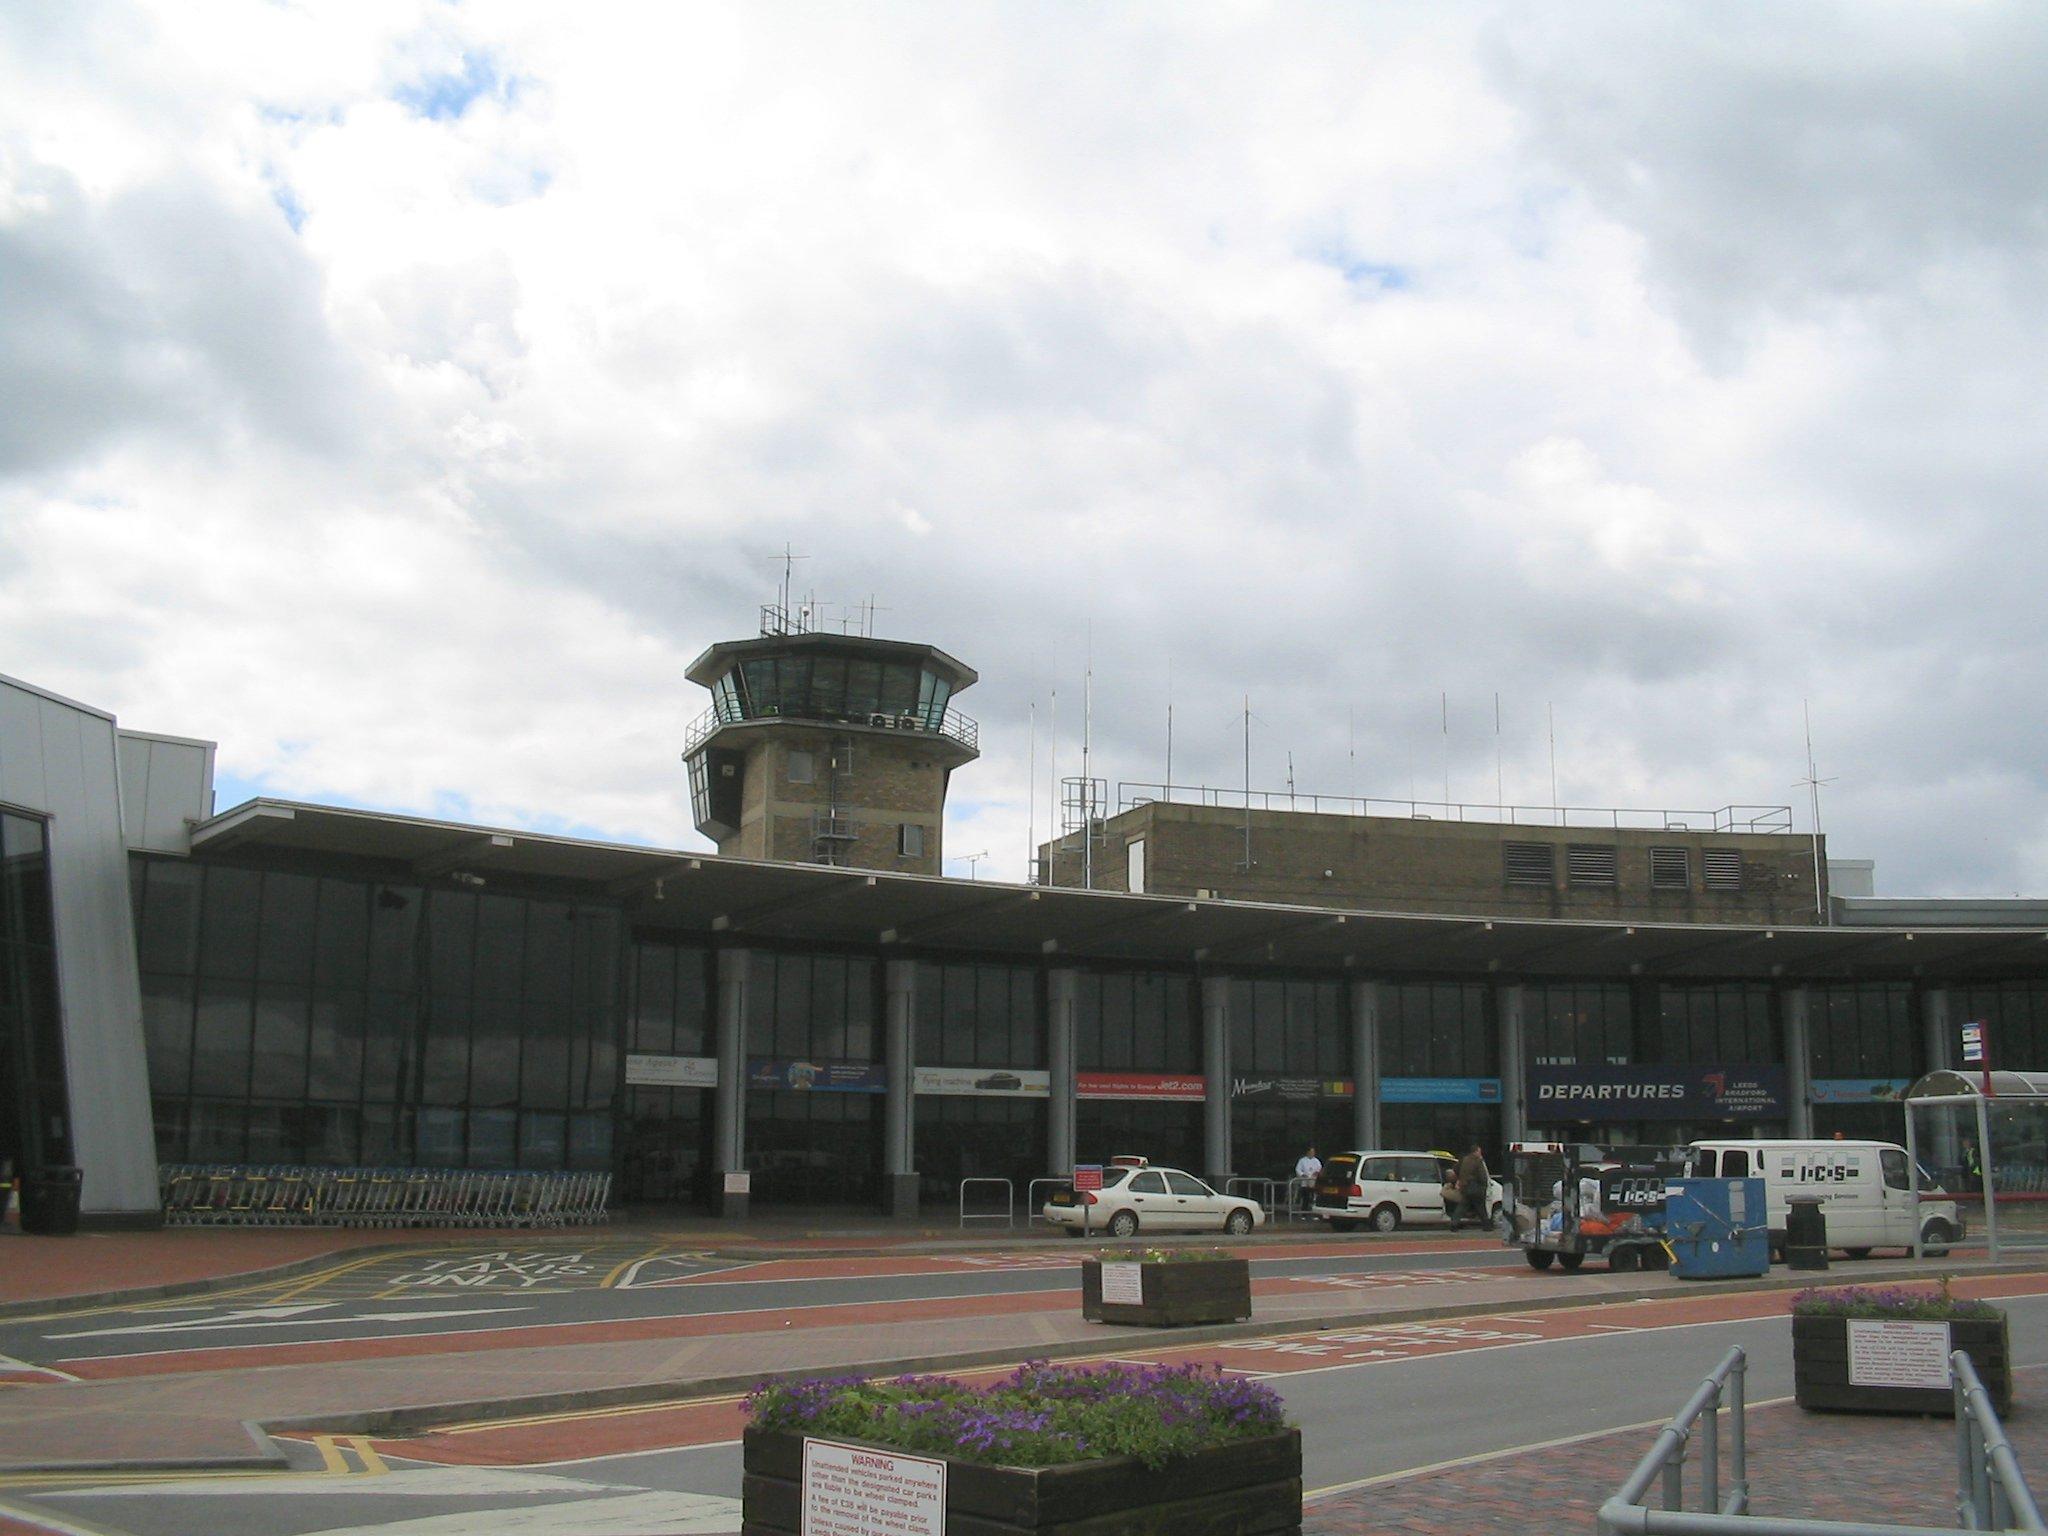 Leed Bradford Airport Parking Sentoal Car Parks